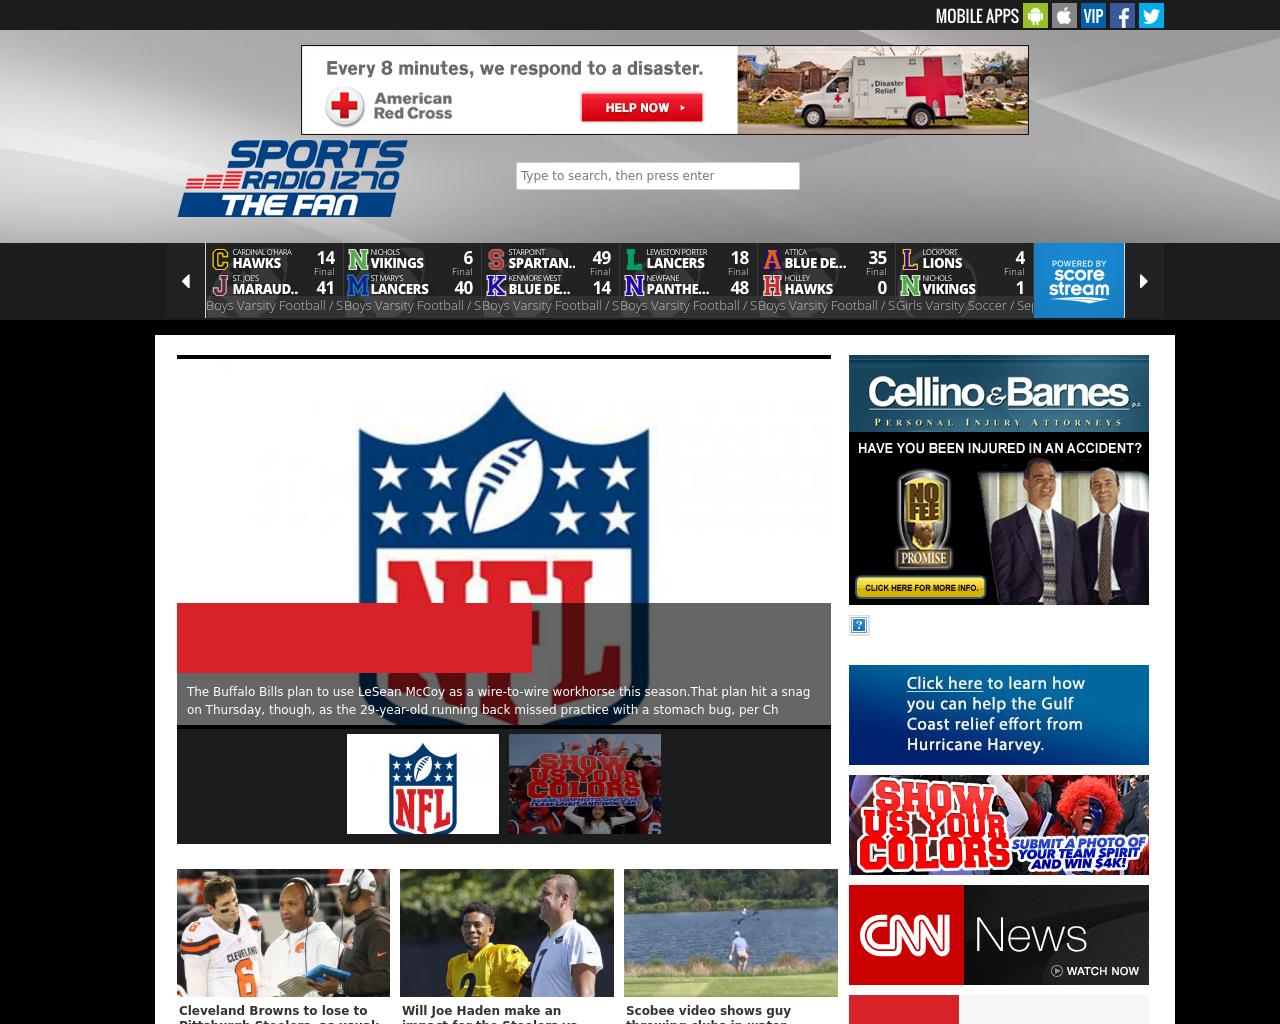 Sports-Radio-1270-Advertising-Reviews-Pricing